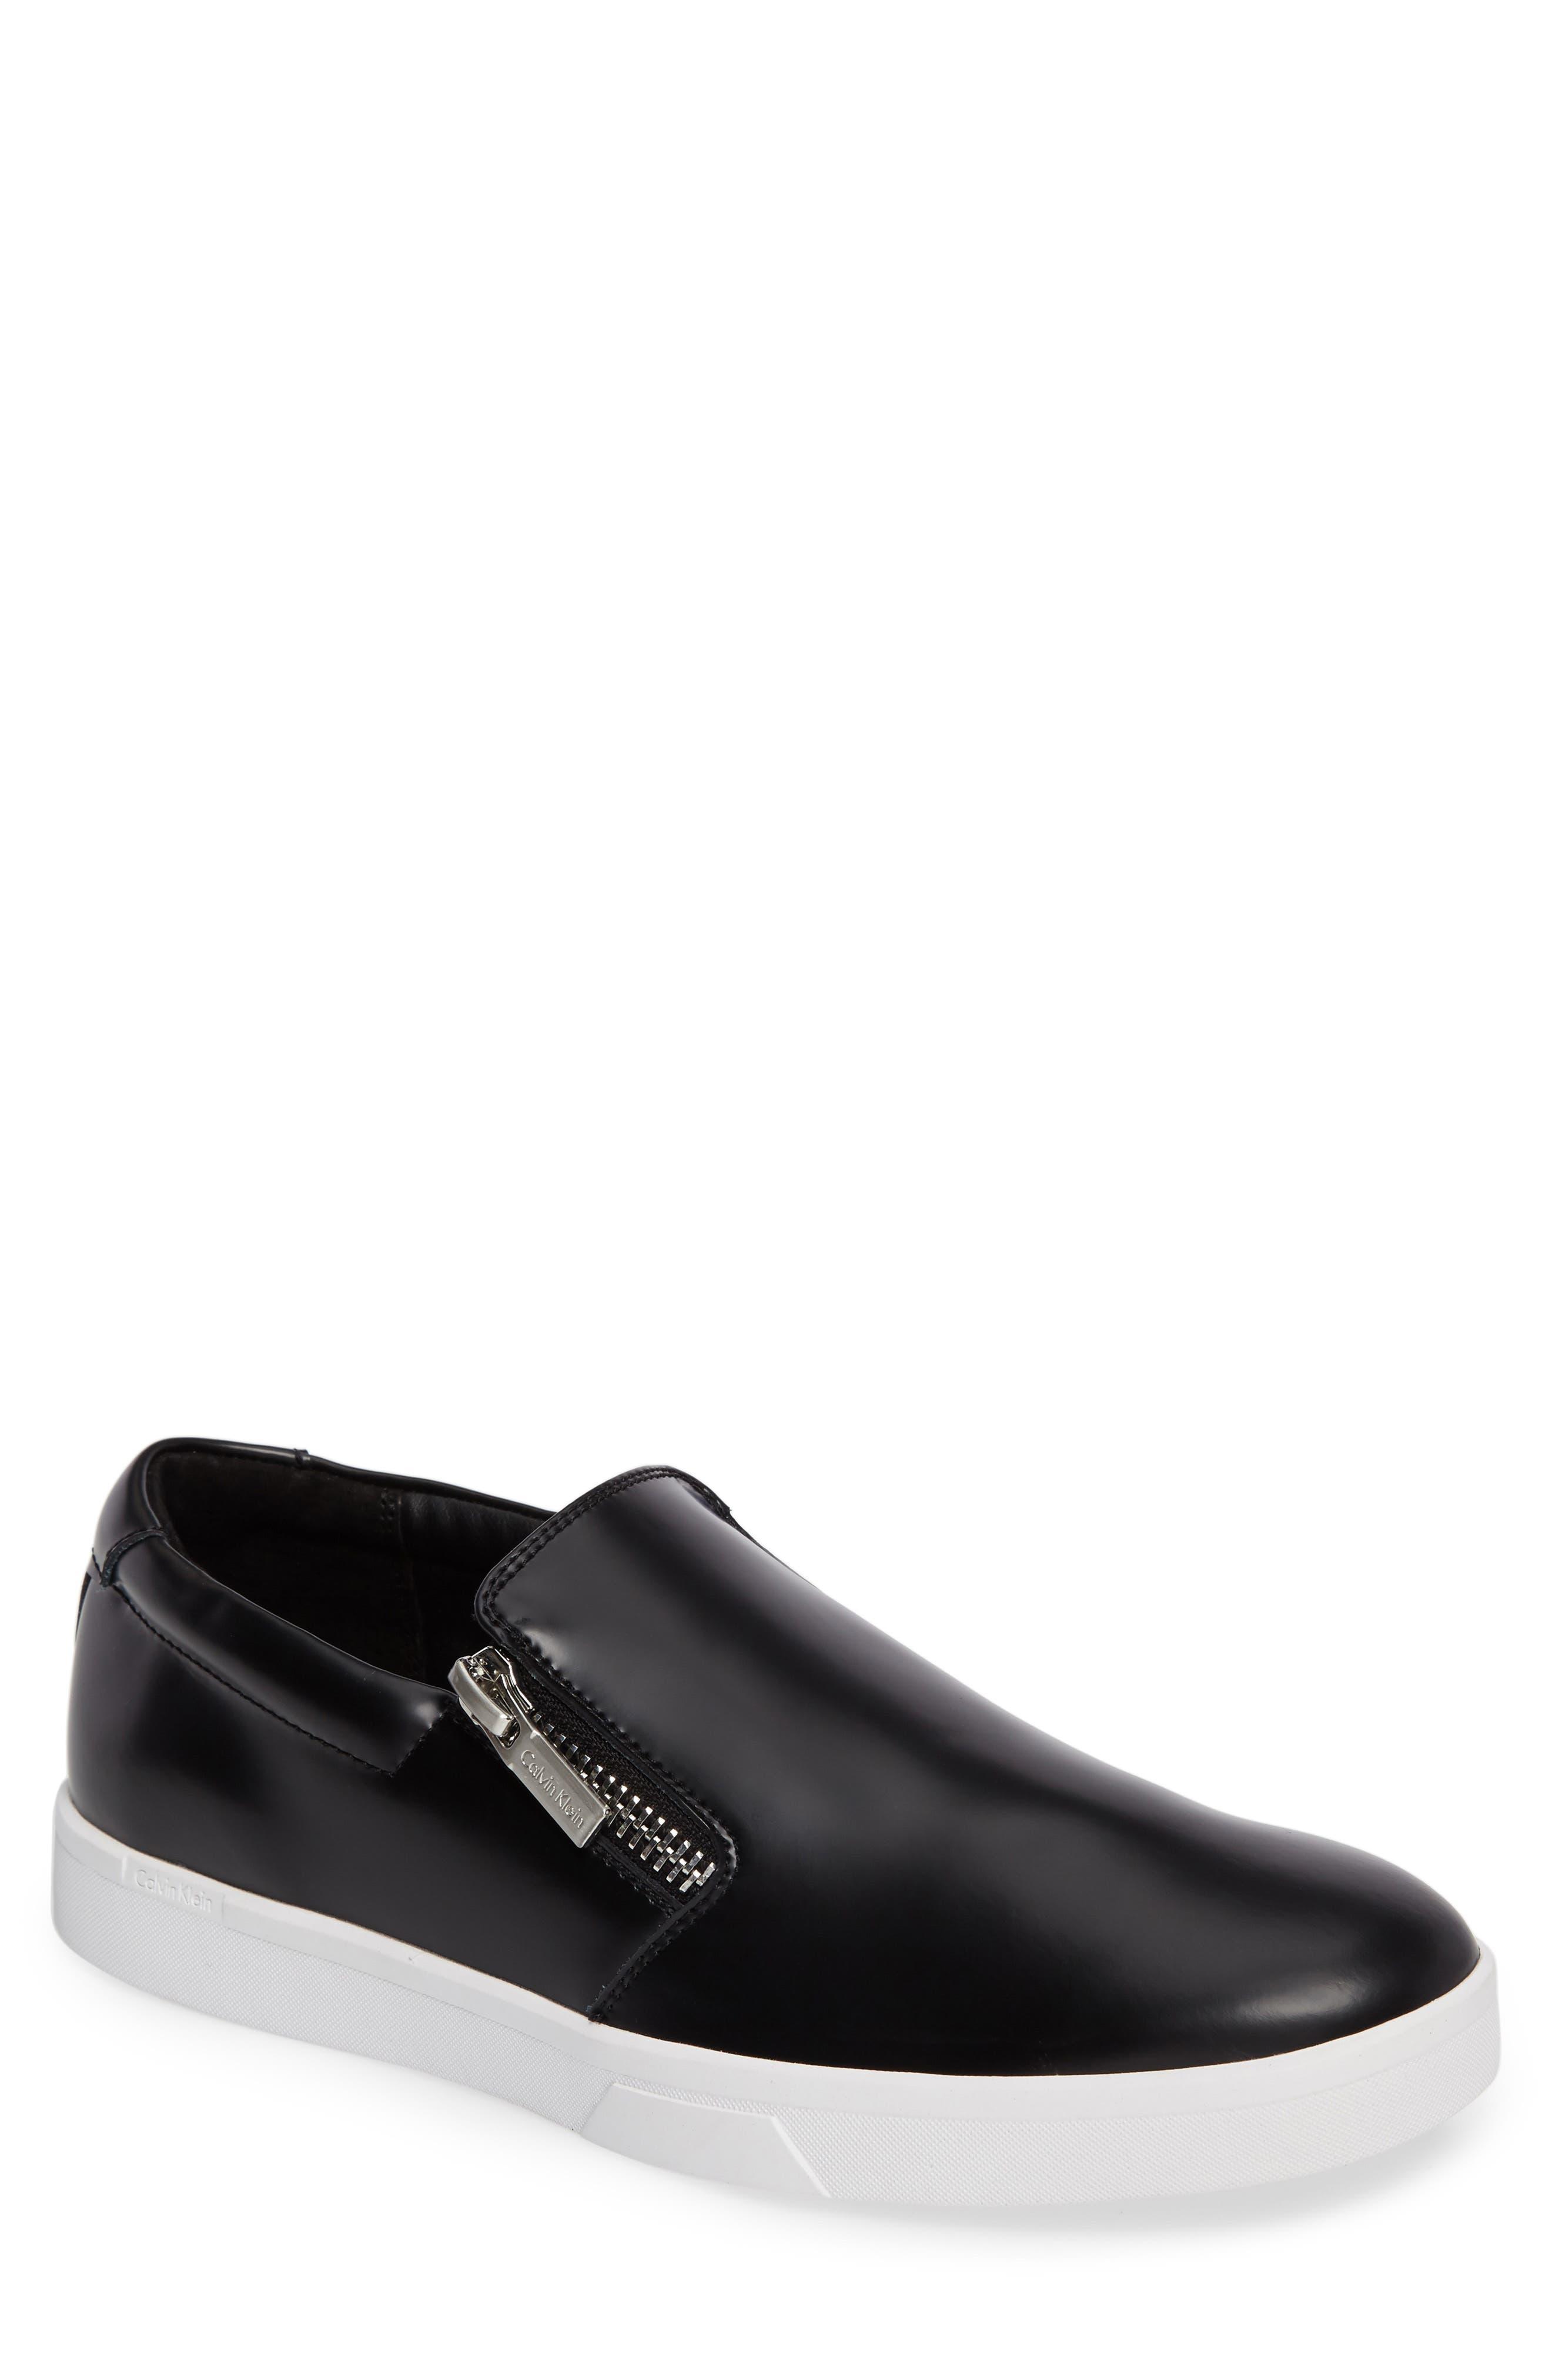 CALVIN KLEIN Ibiza Slip-On Zip Sneaker